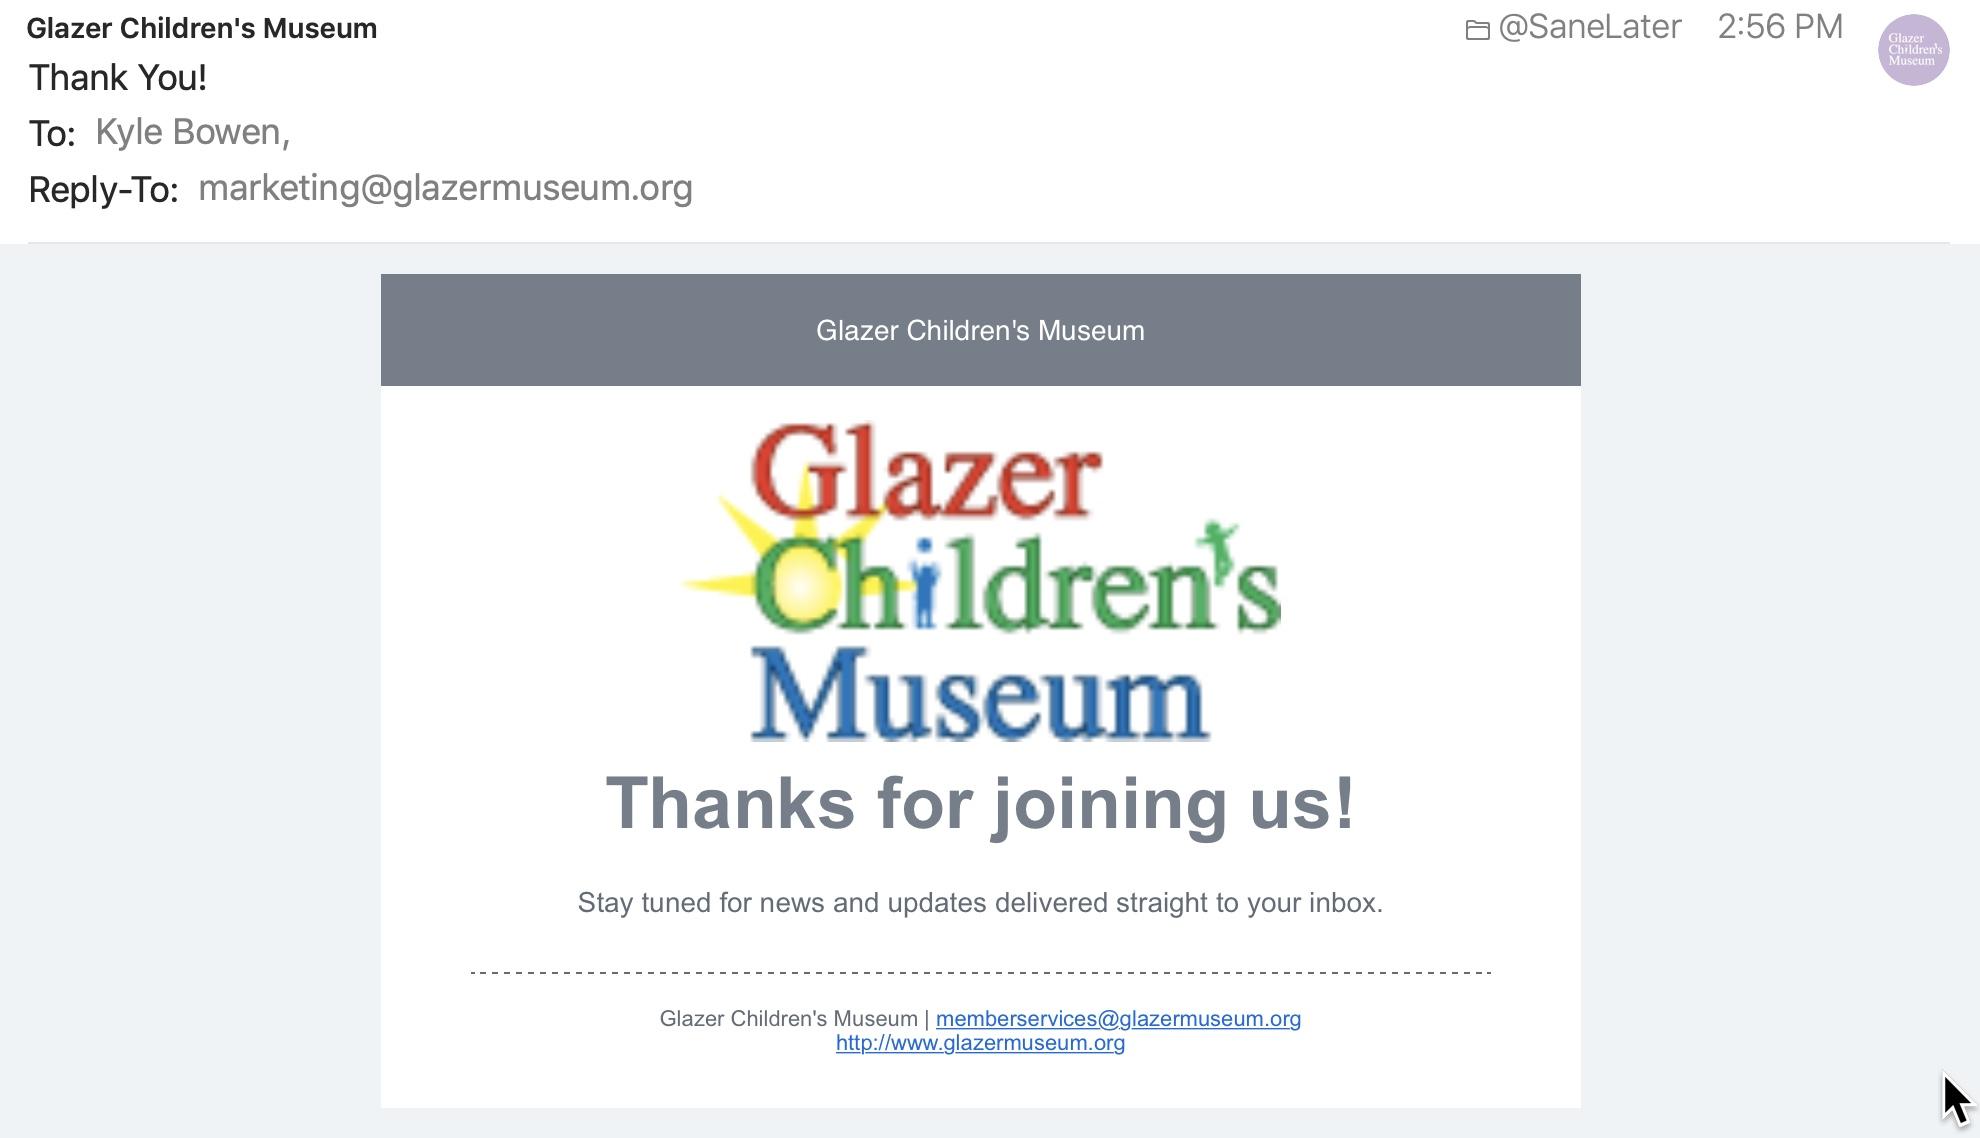 Glazer Children's Museum's welcome email